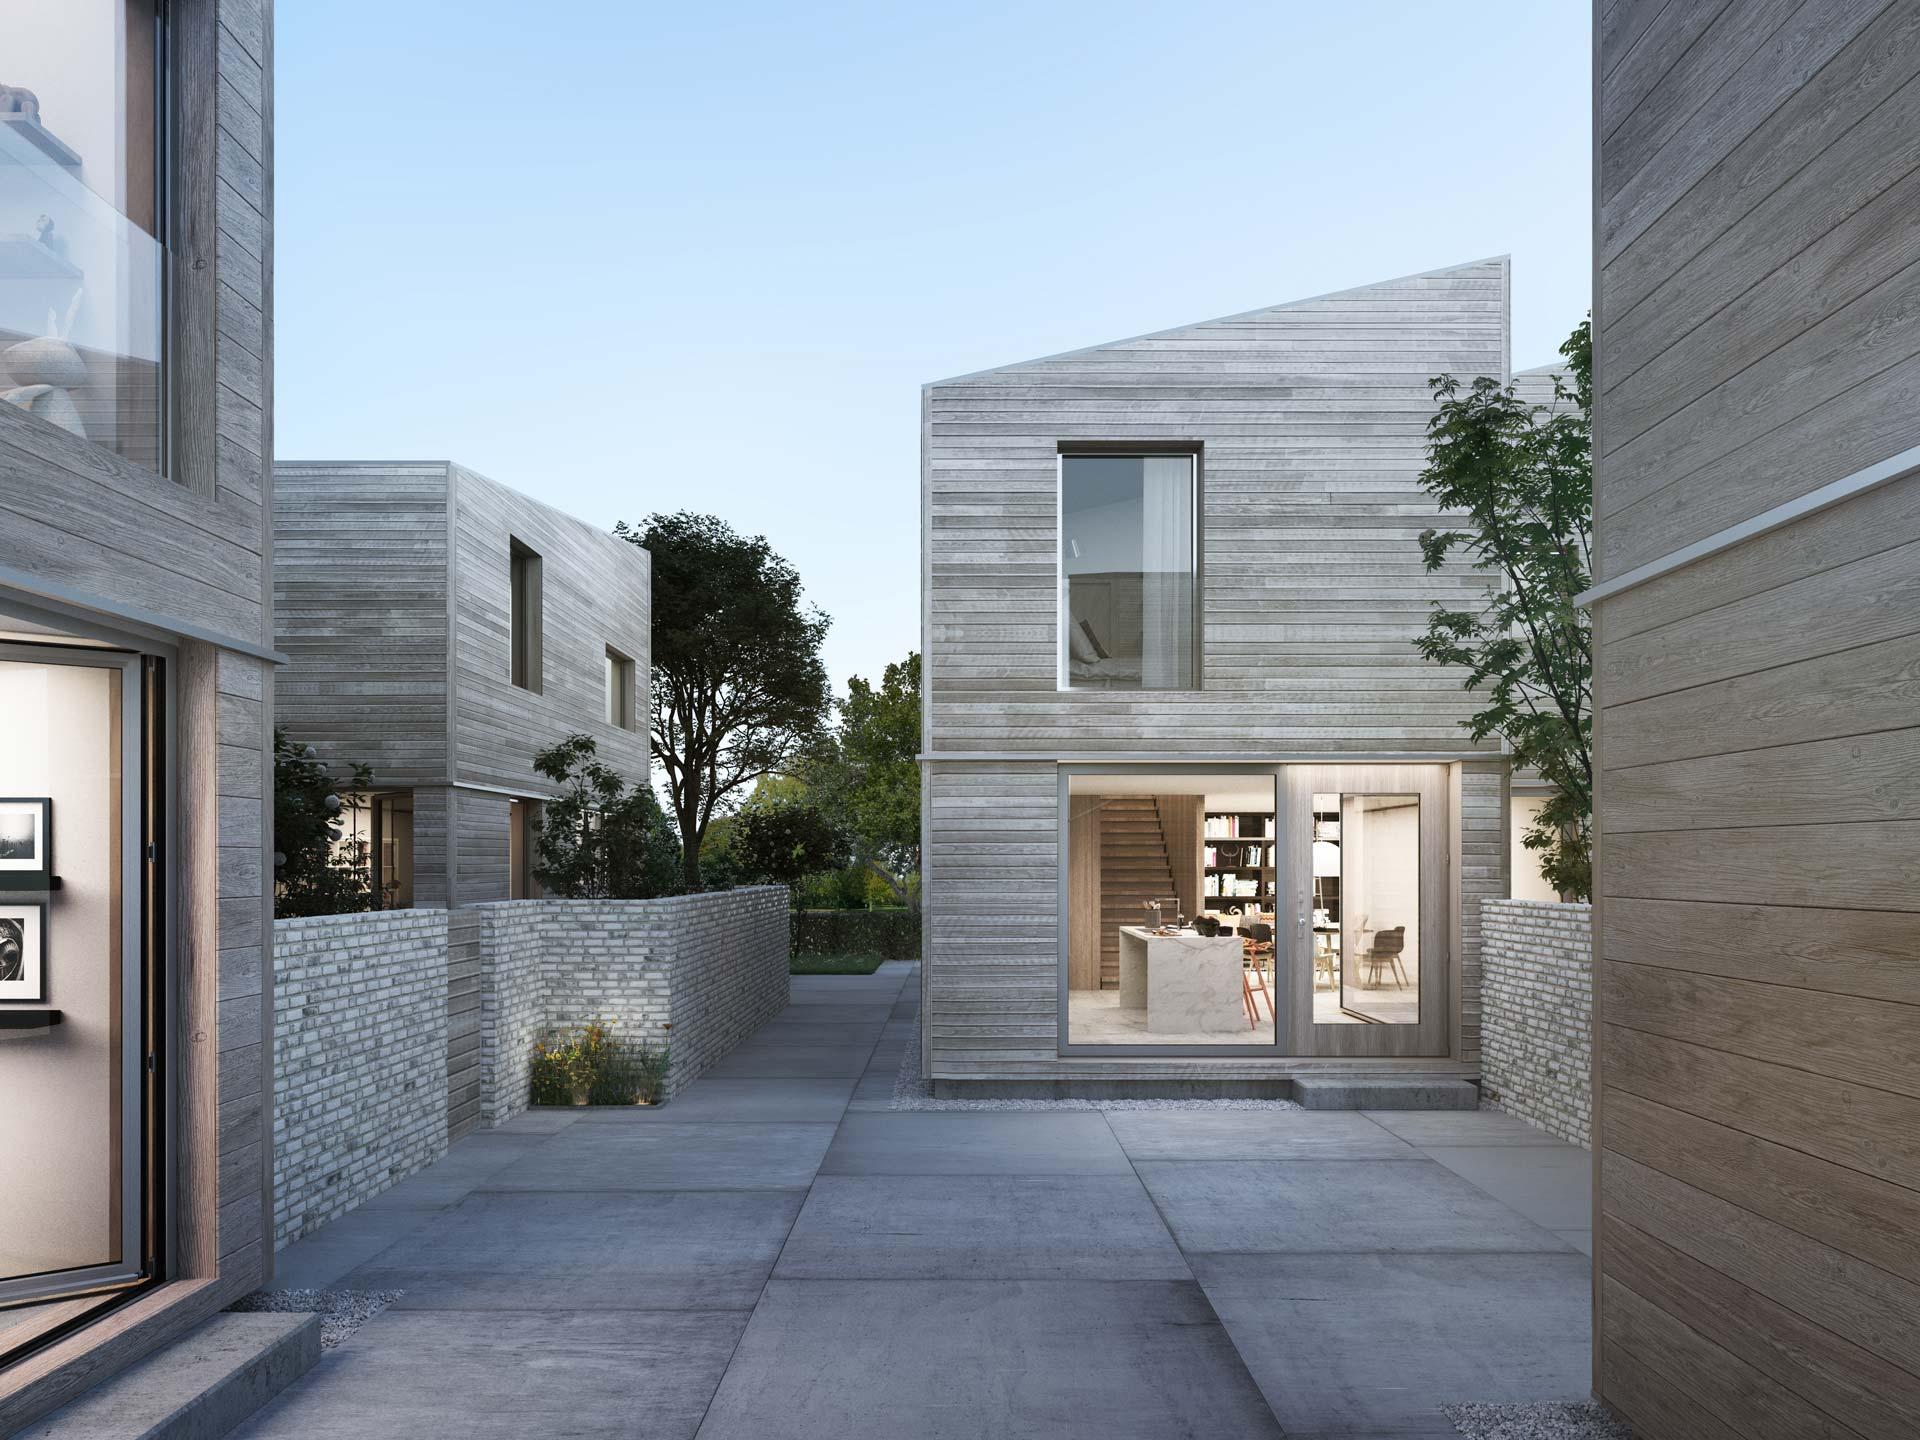 Grasweg - Limbrock Tubbesing Architekten Werther